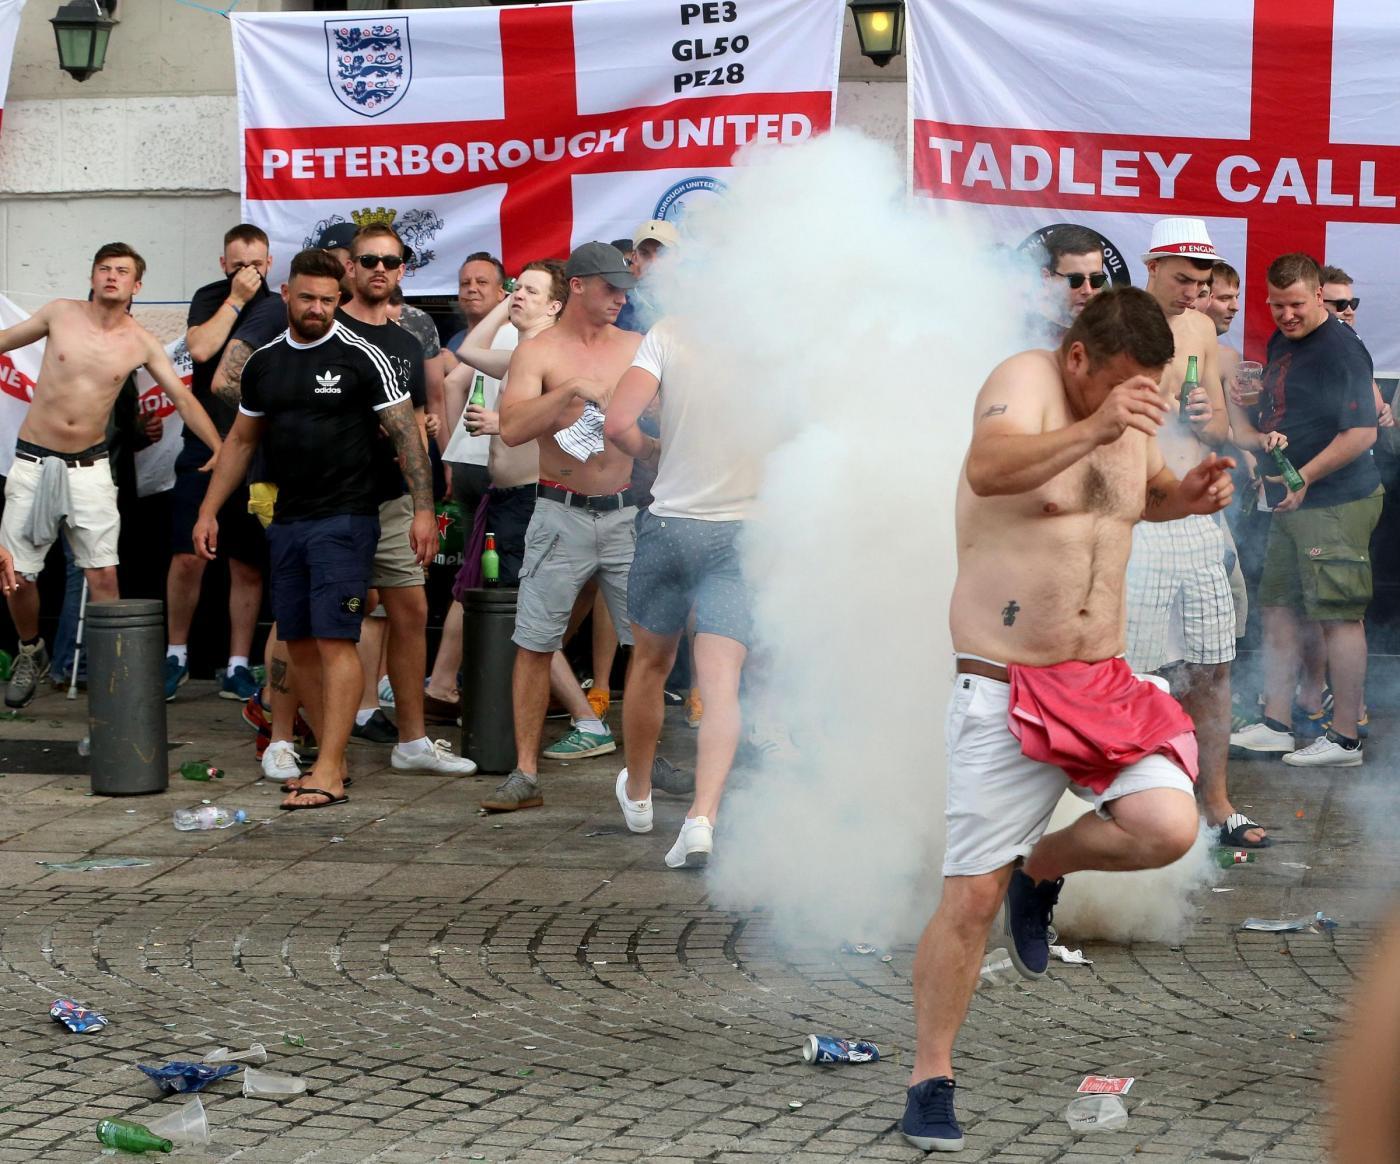 Euro 2016, scontri a Marsiglia tra hooligans inglesi, russi, francesi e polizia